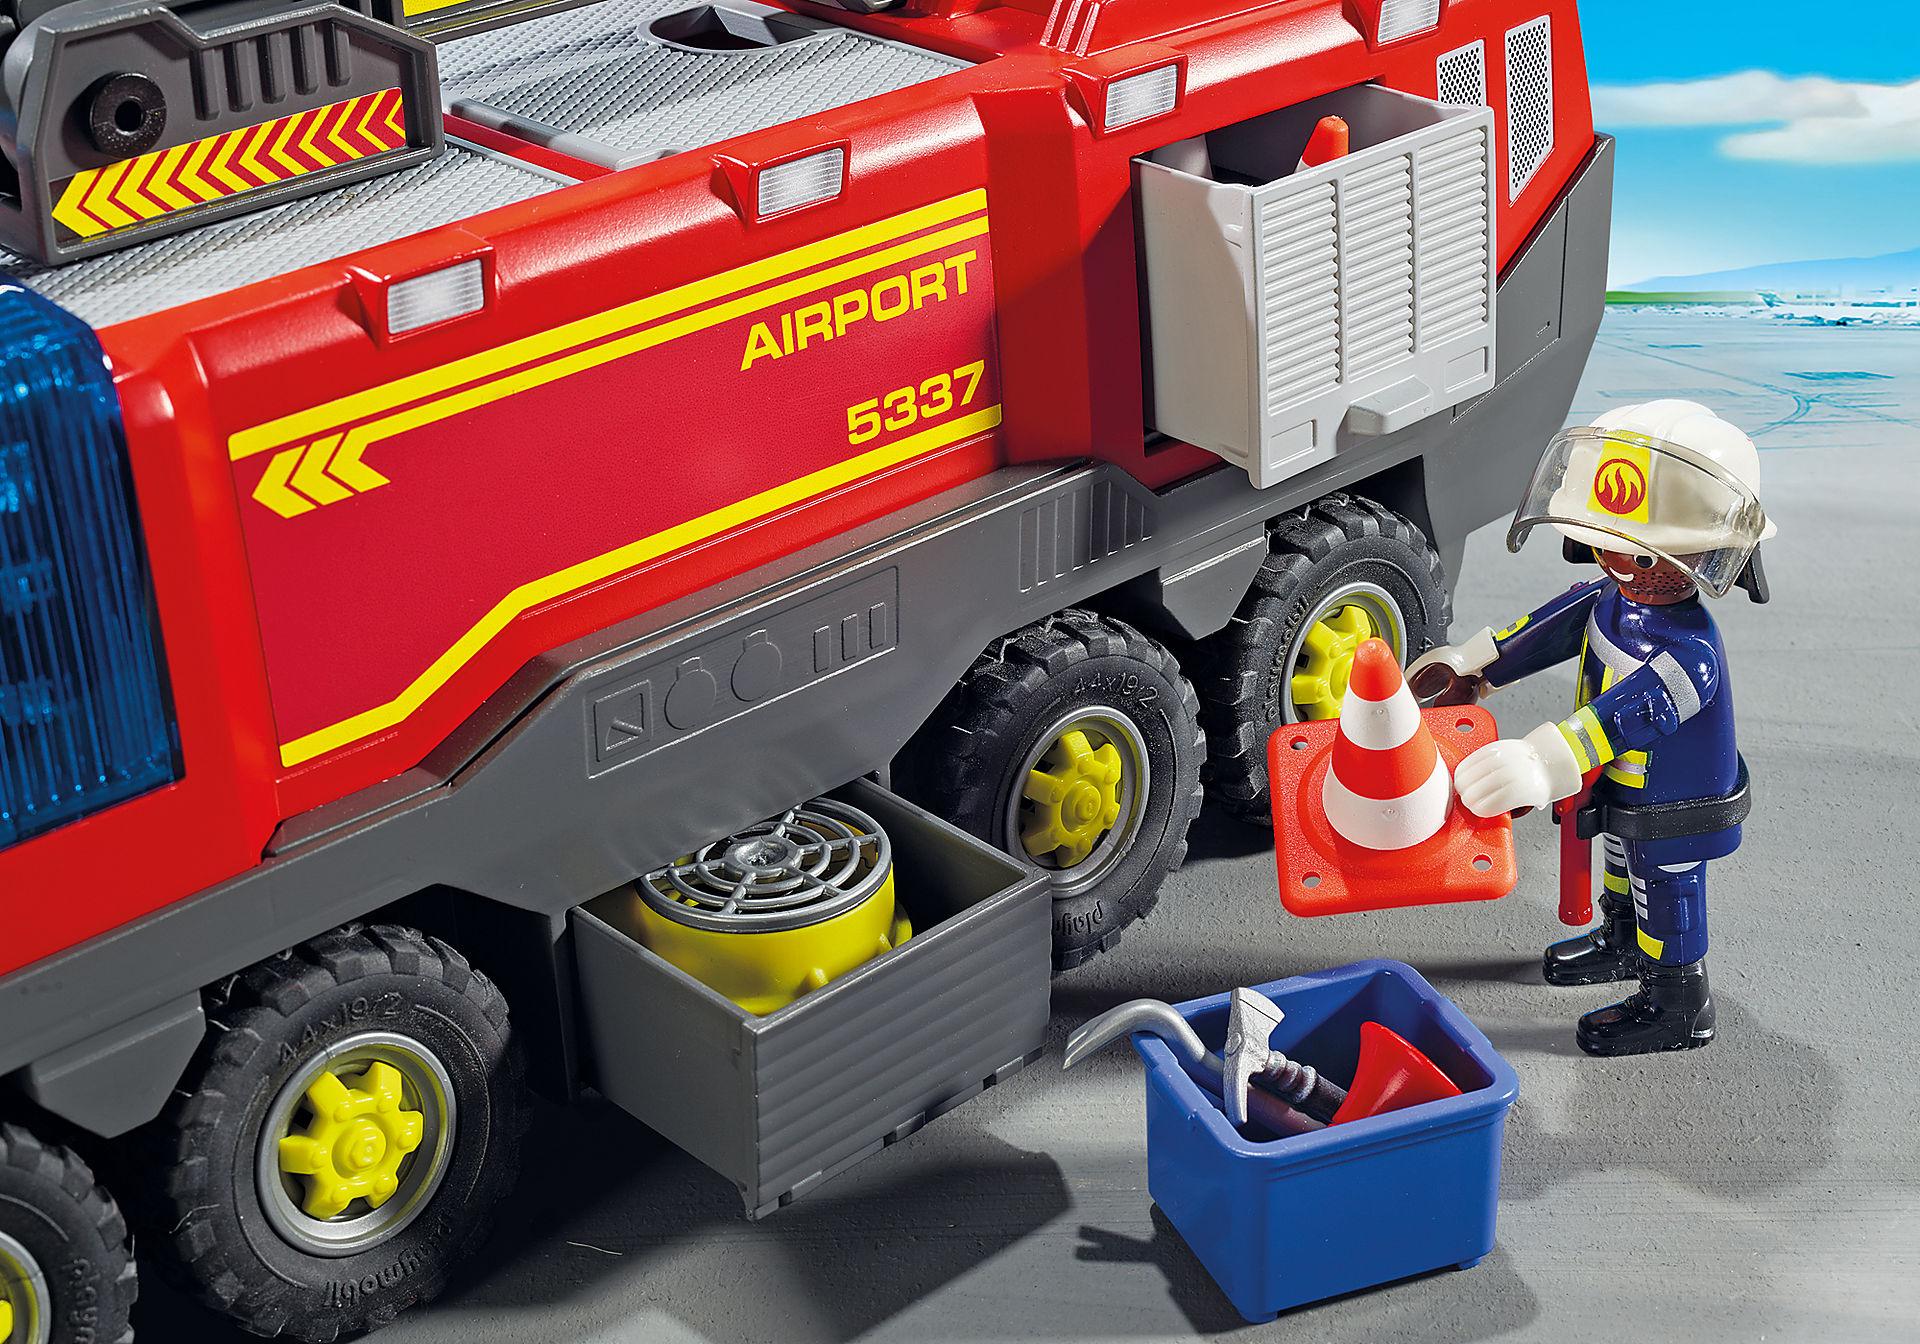 5337 Lufthavnsbrandbil med lys og lyd zoom image7